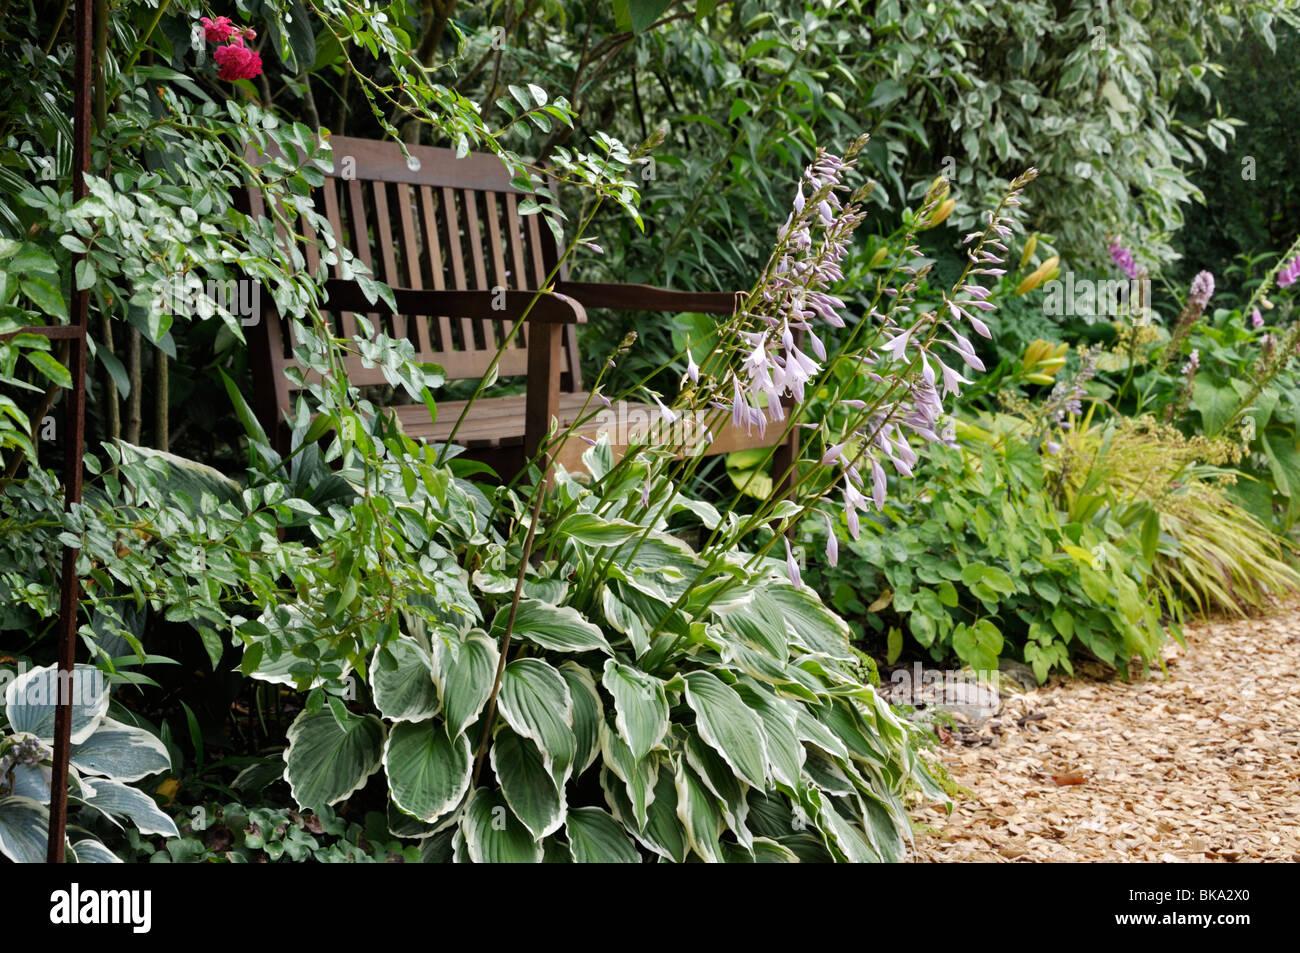 Plantain lilies (Hosta) besides a garden bench. Design: Marianne and Detlef Lüdke - Stock Image